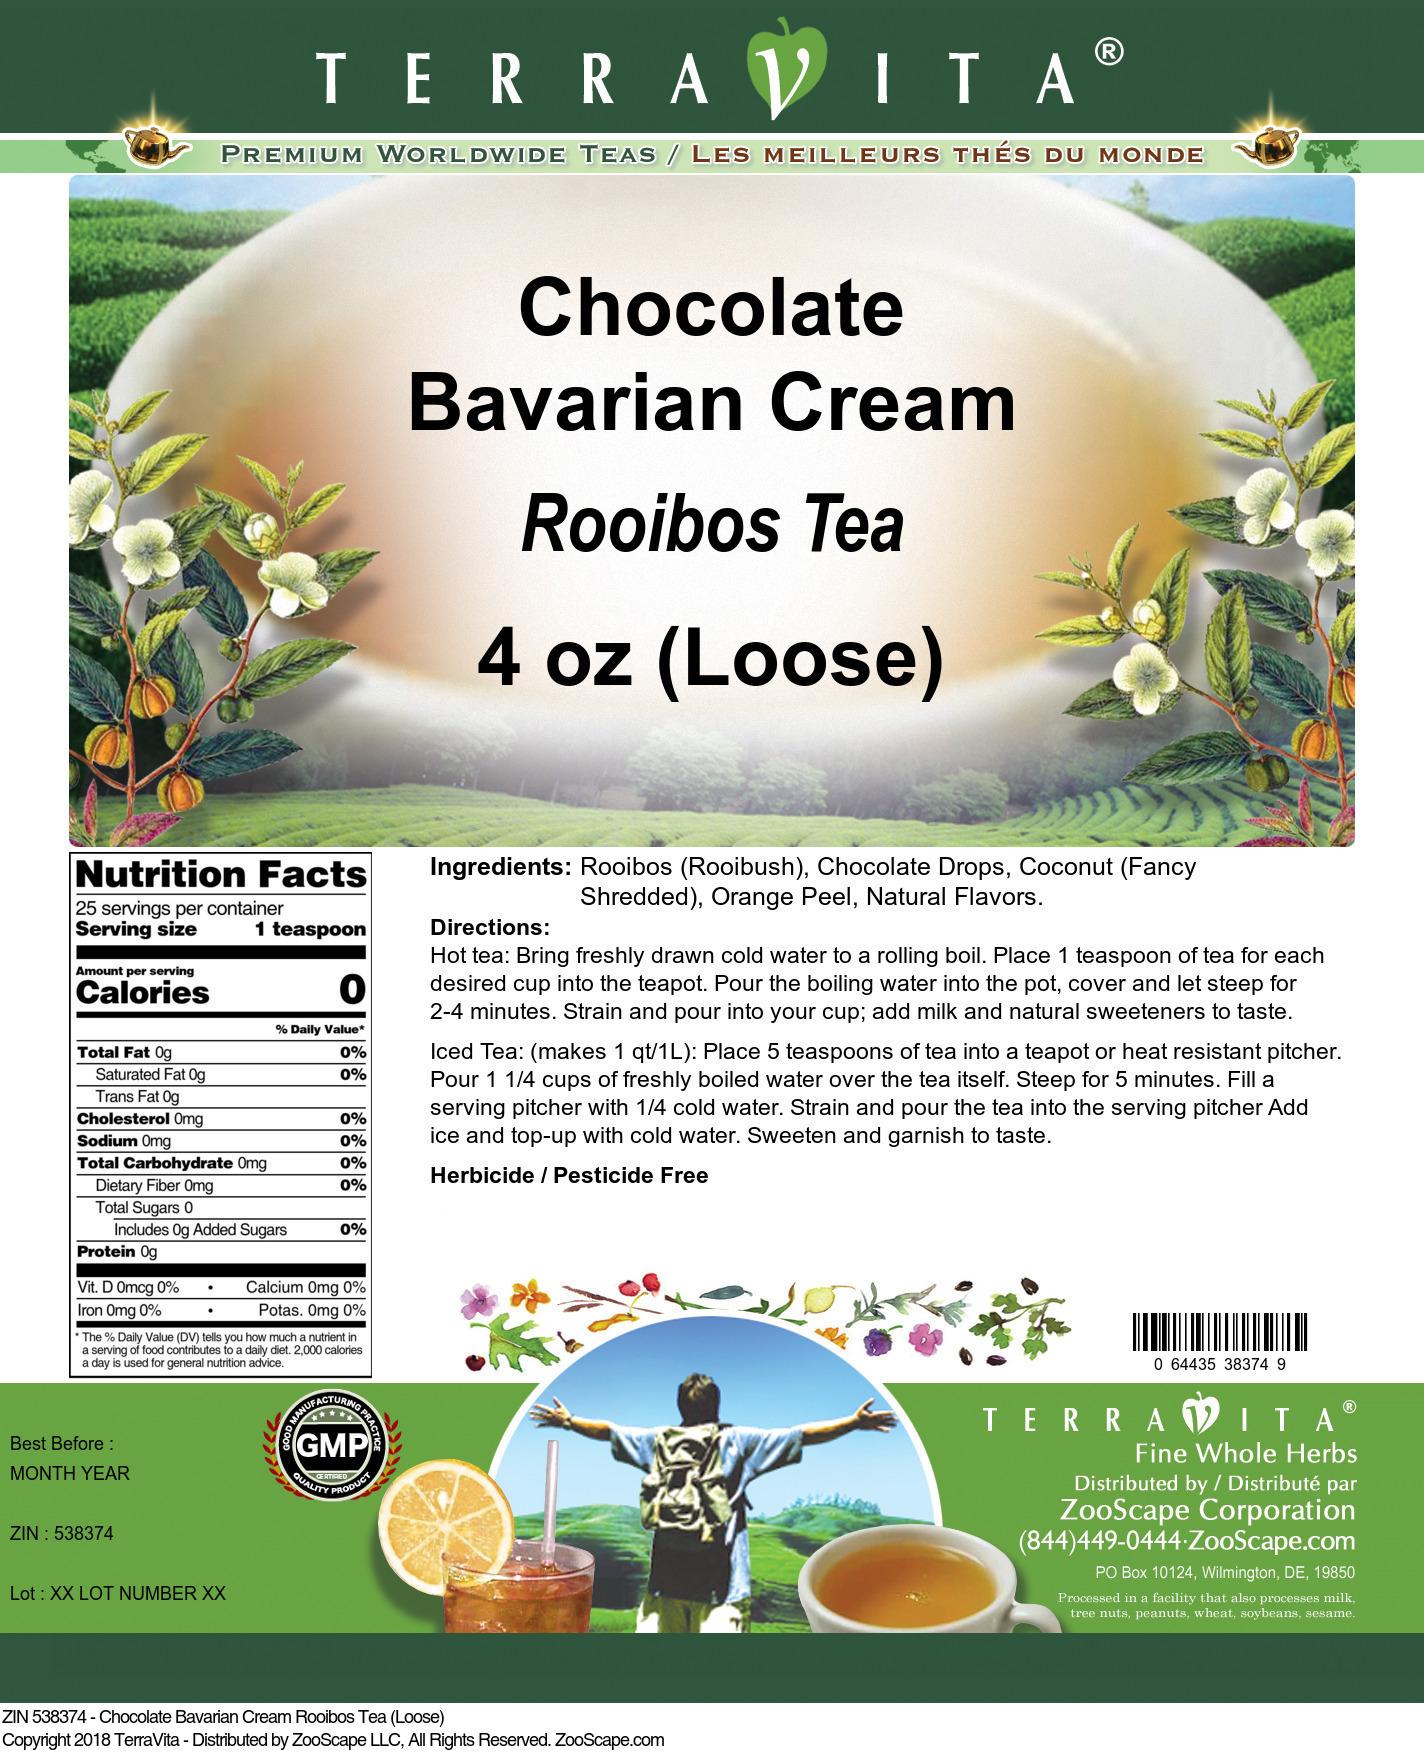 Chocolate Bavarian Cream Rooibos Tea